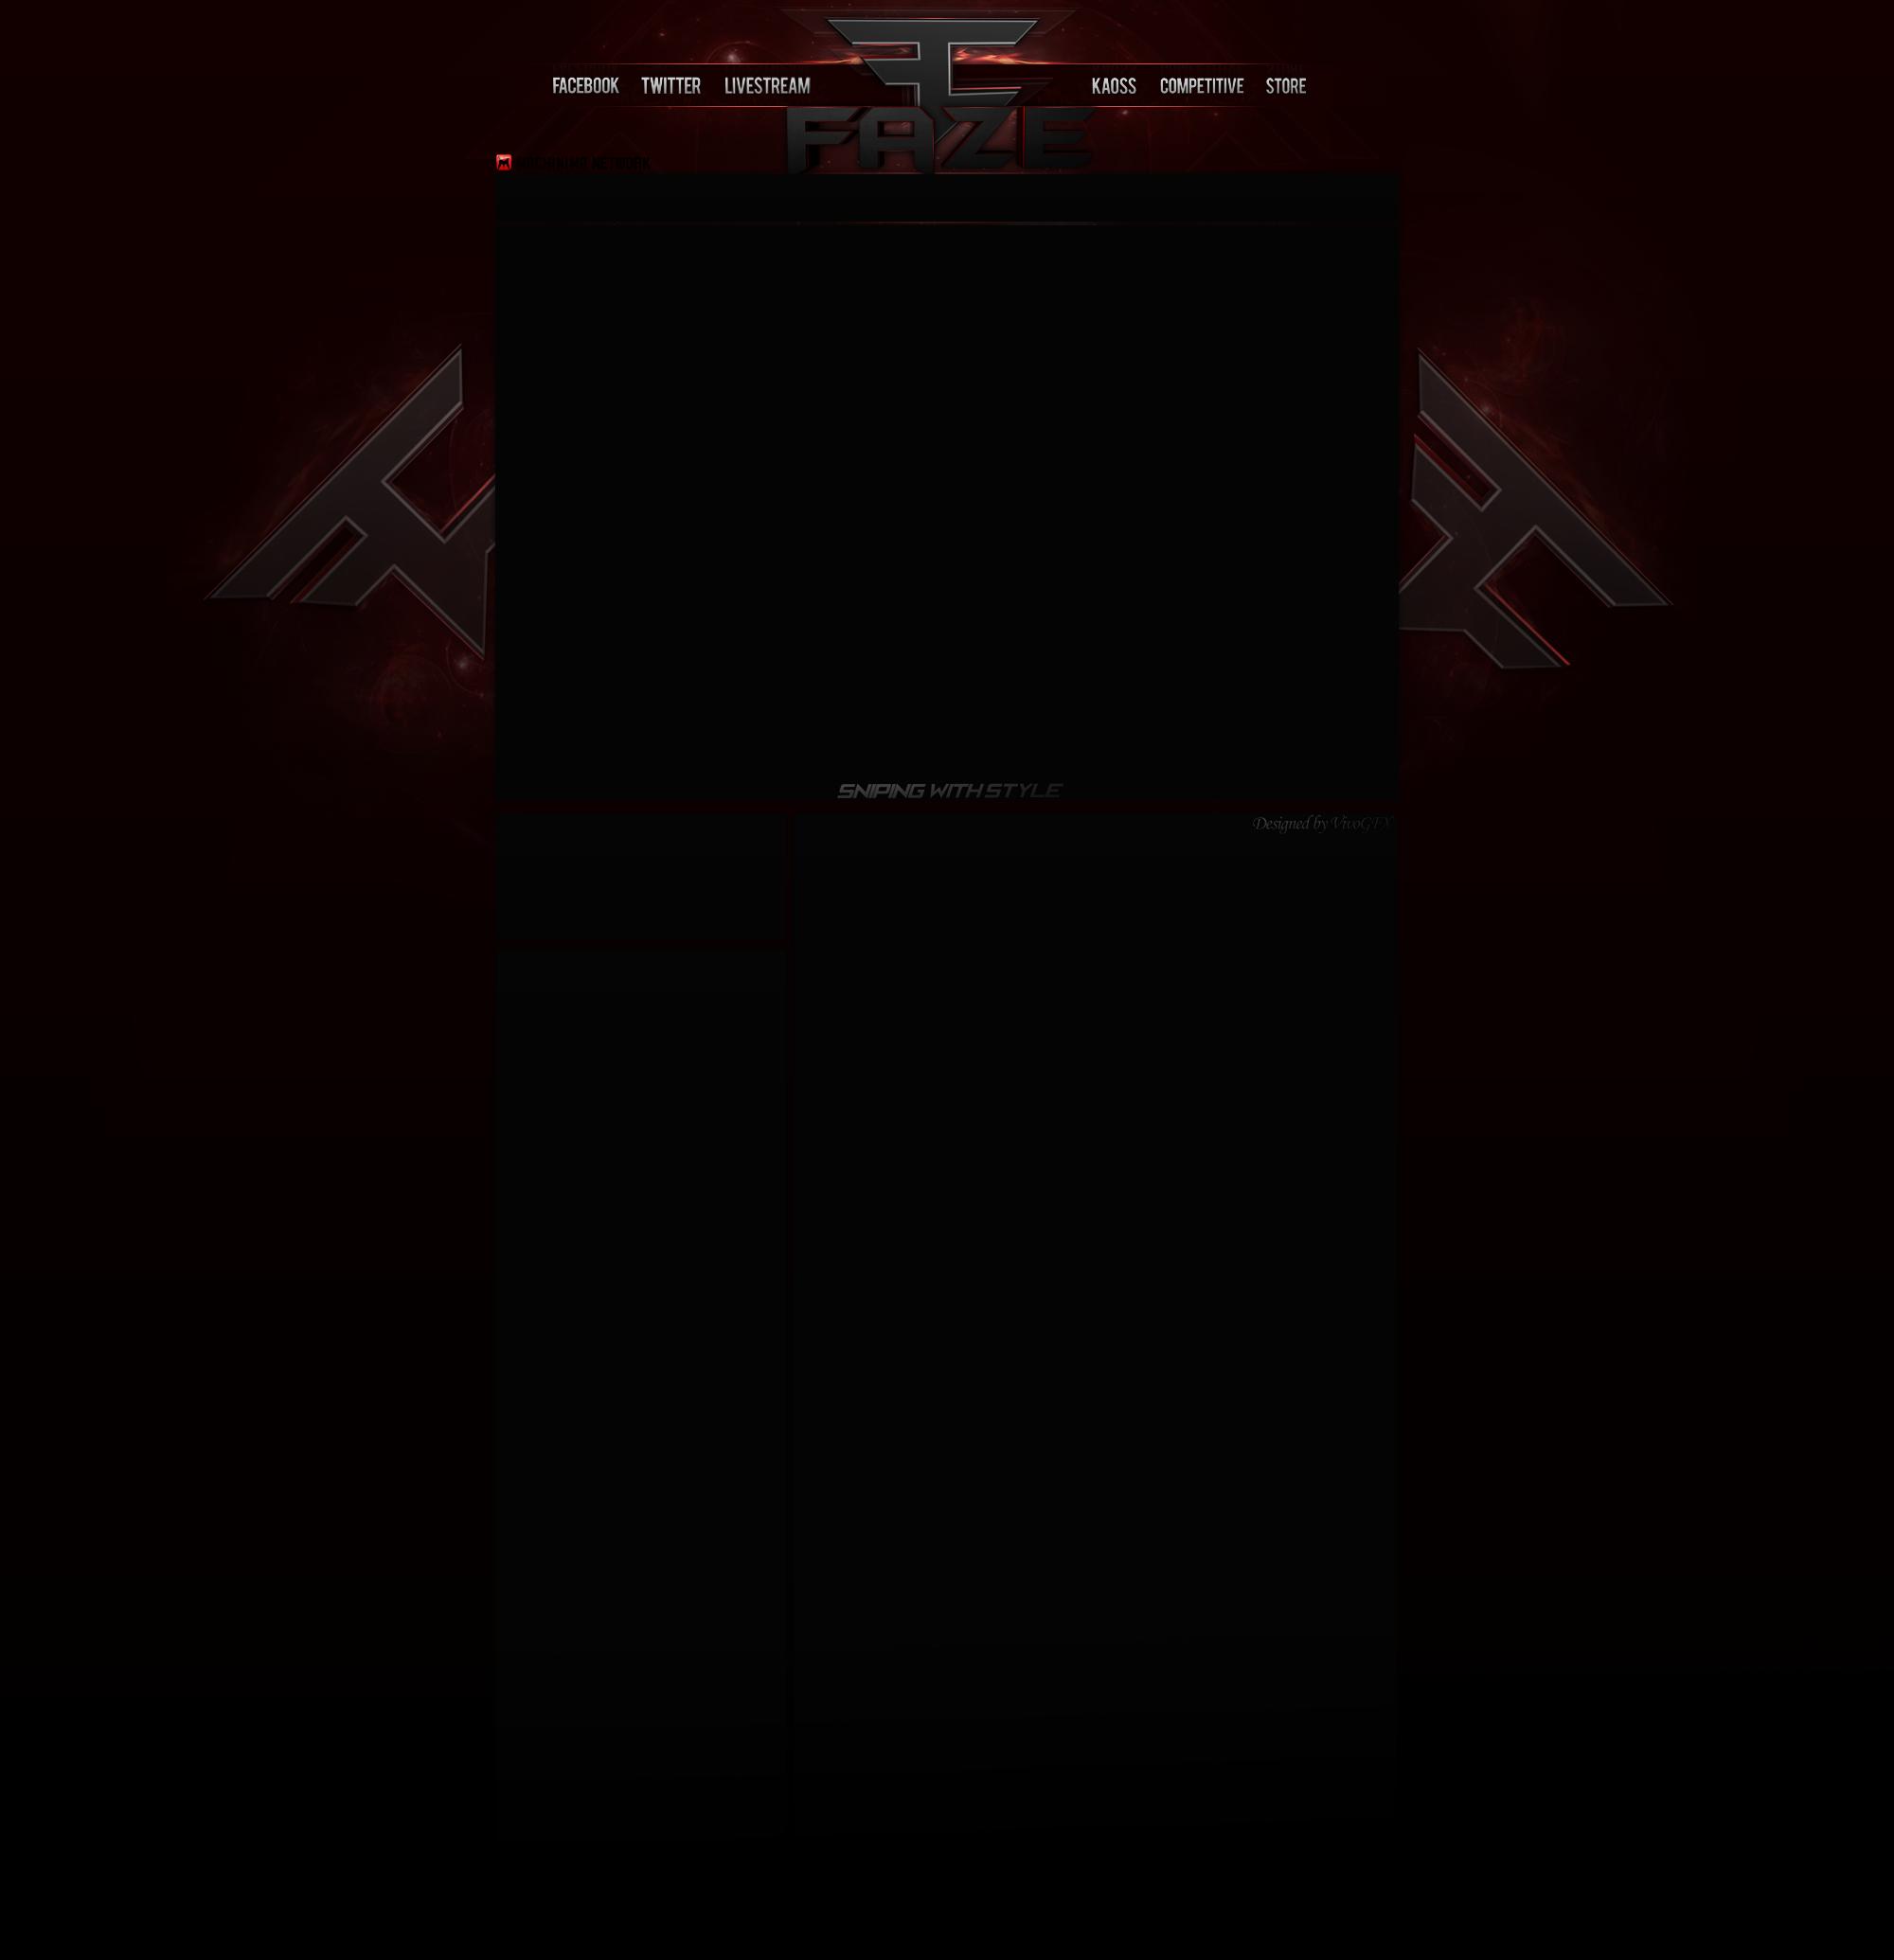 faze clan wallpaper pack v4 download